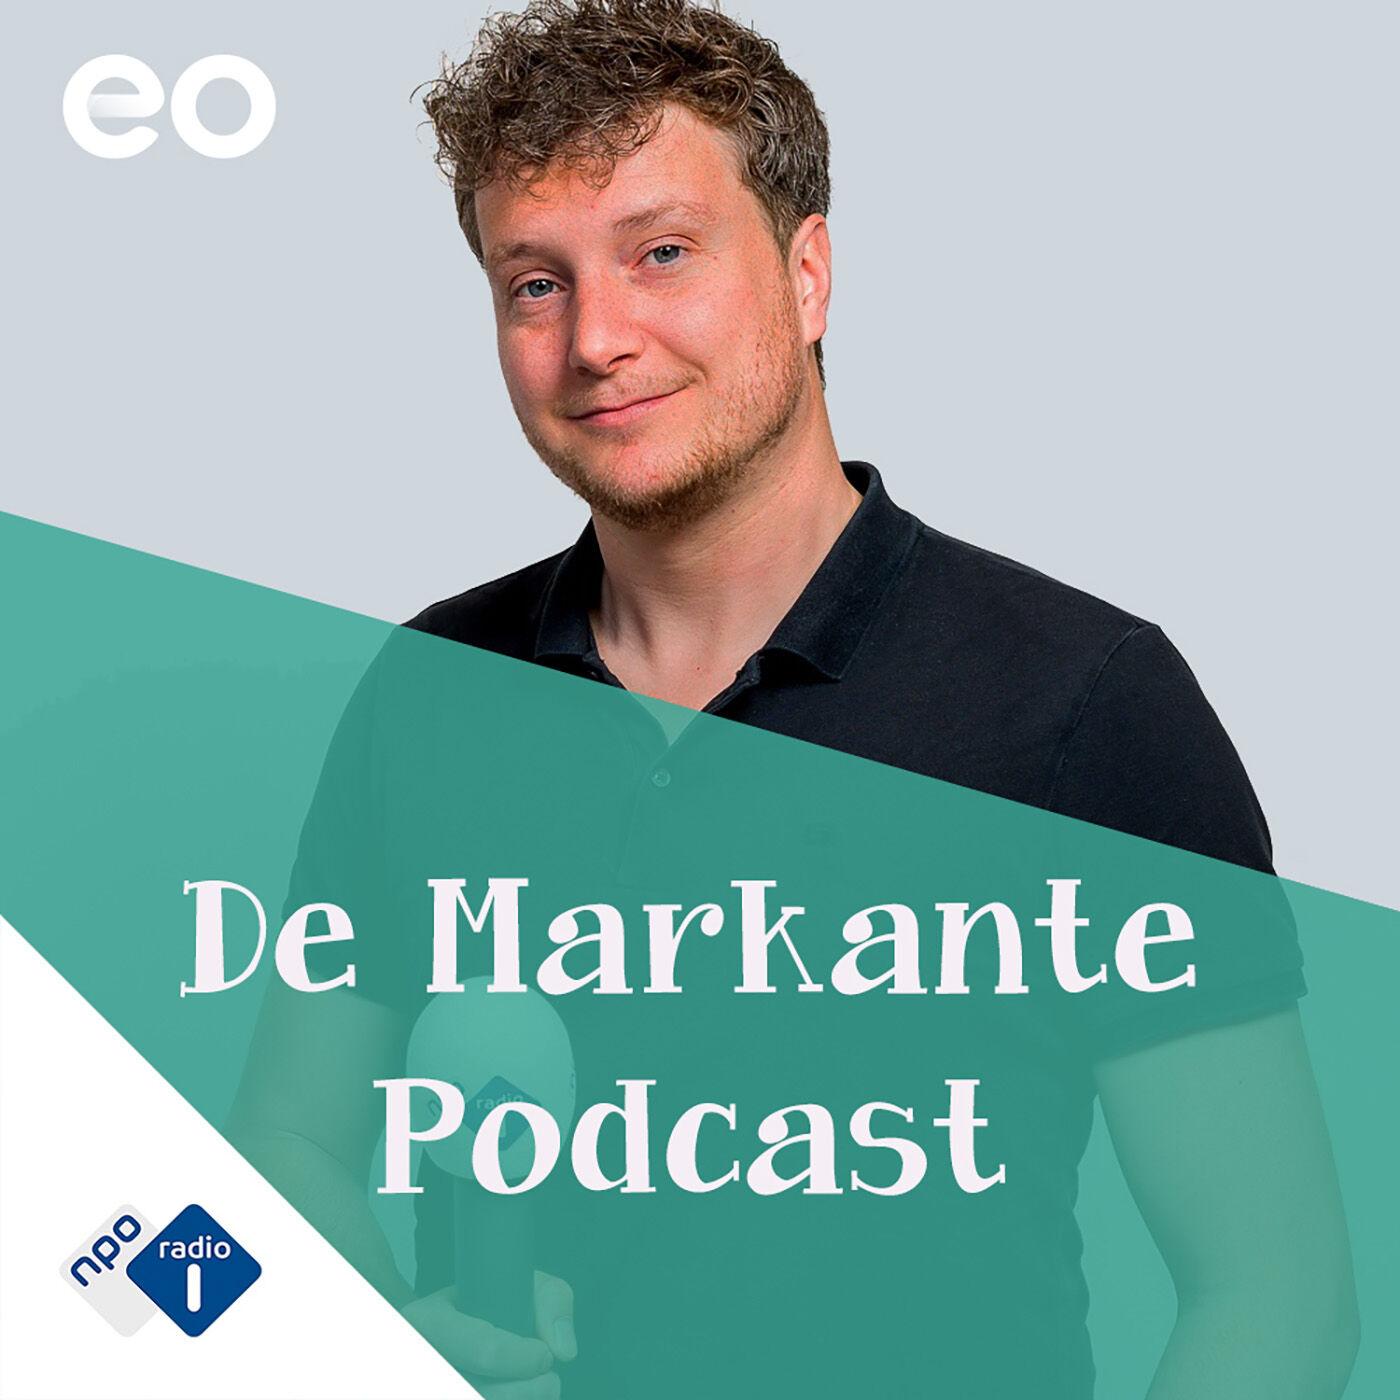 De Markante Podcast